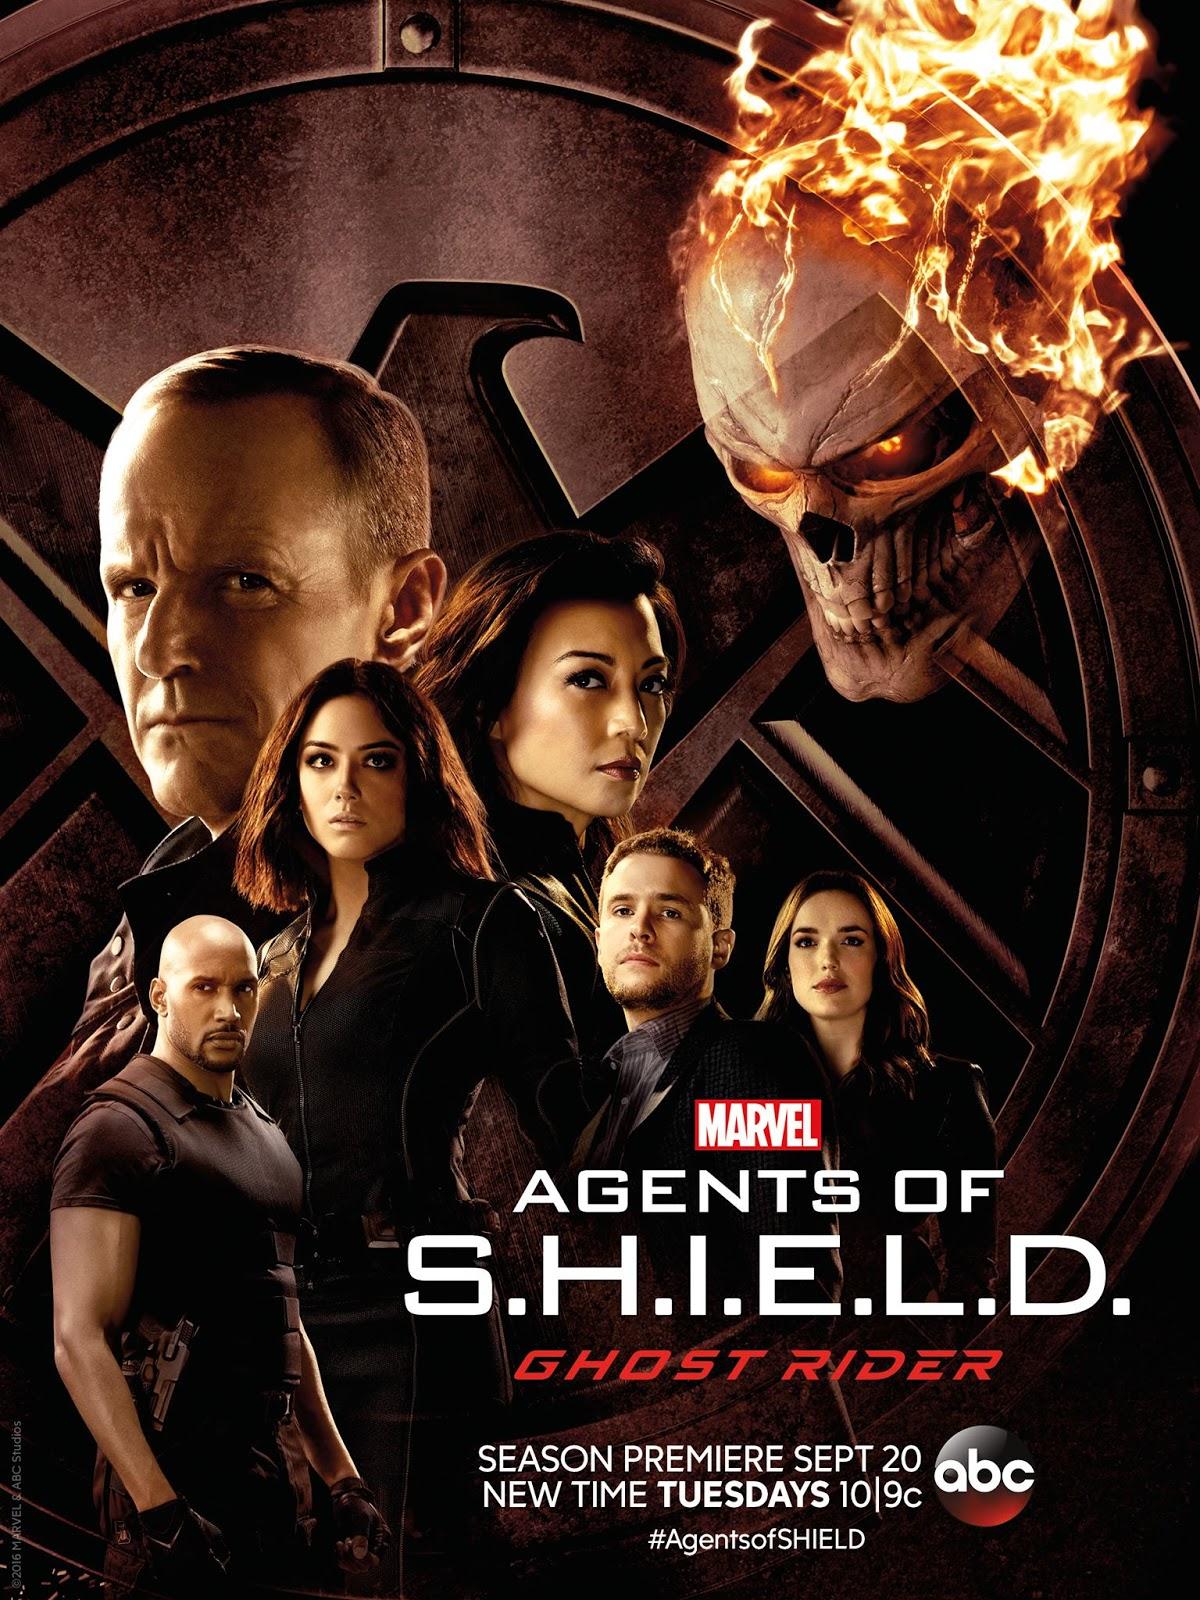 Agents of S.H.I.E.L.D. T4 E3